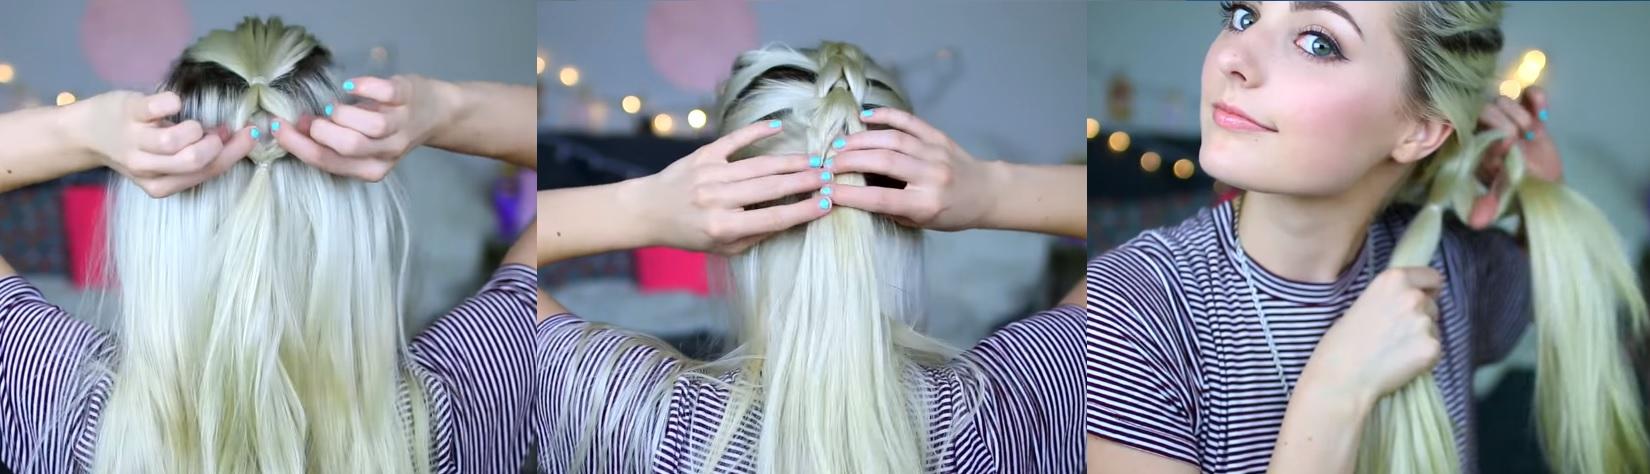 frizura2